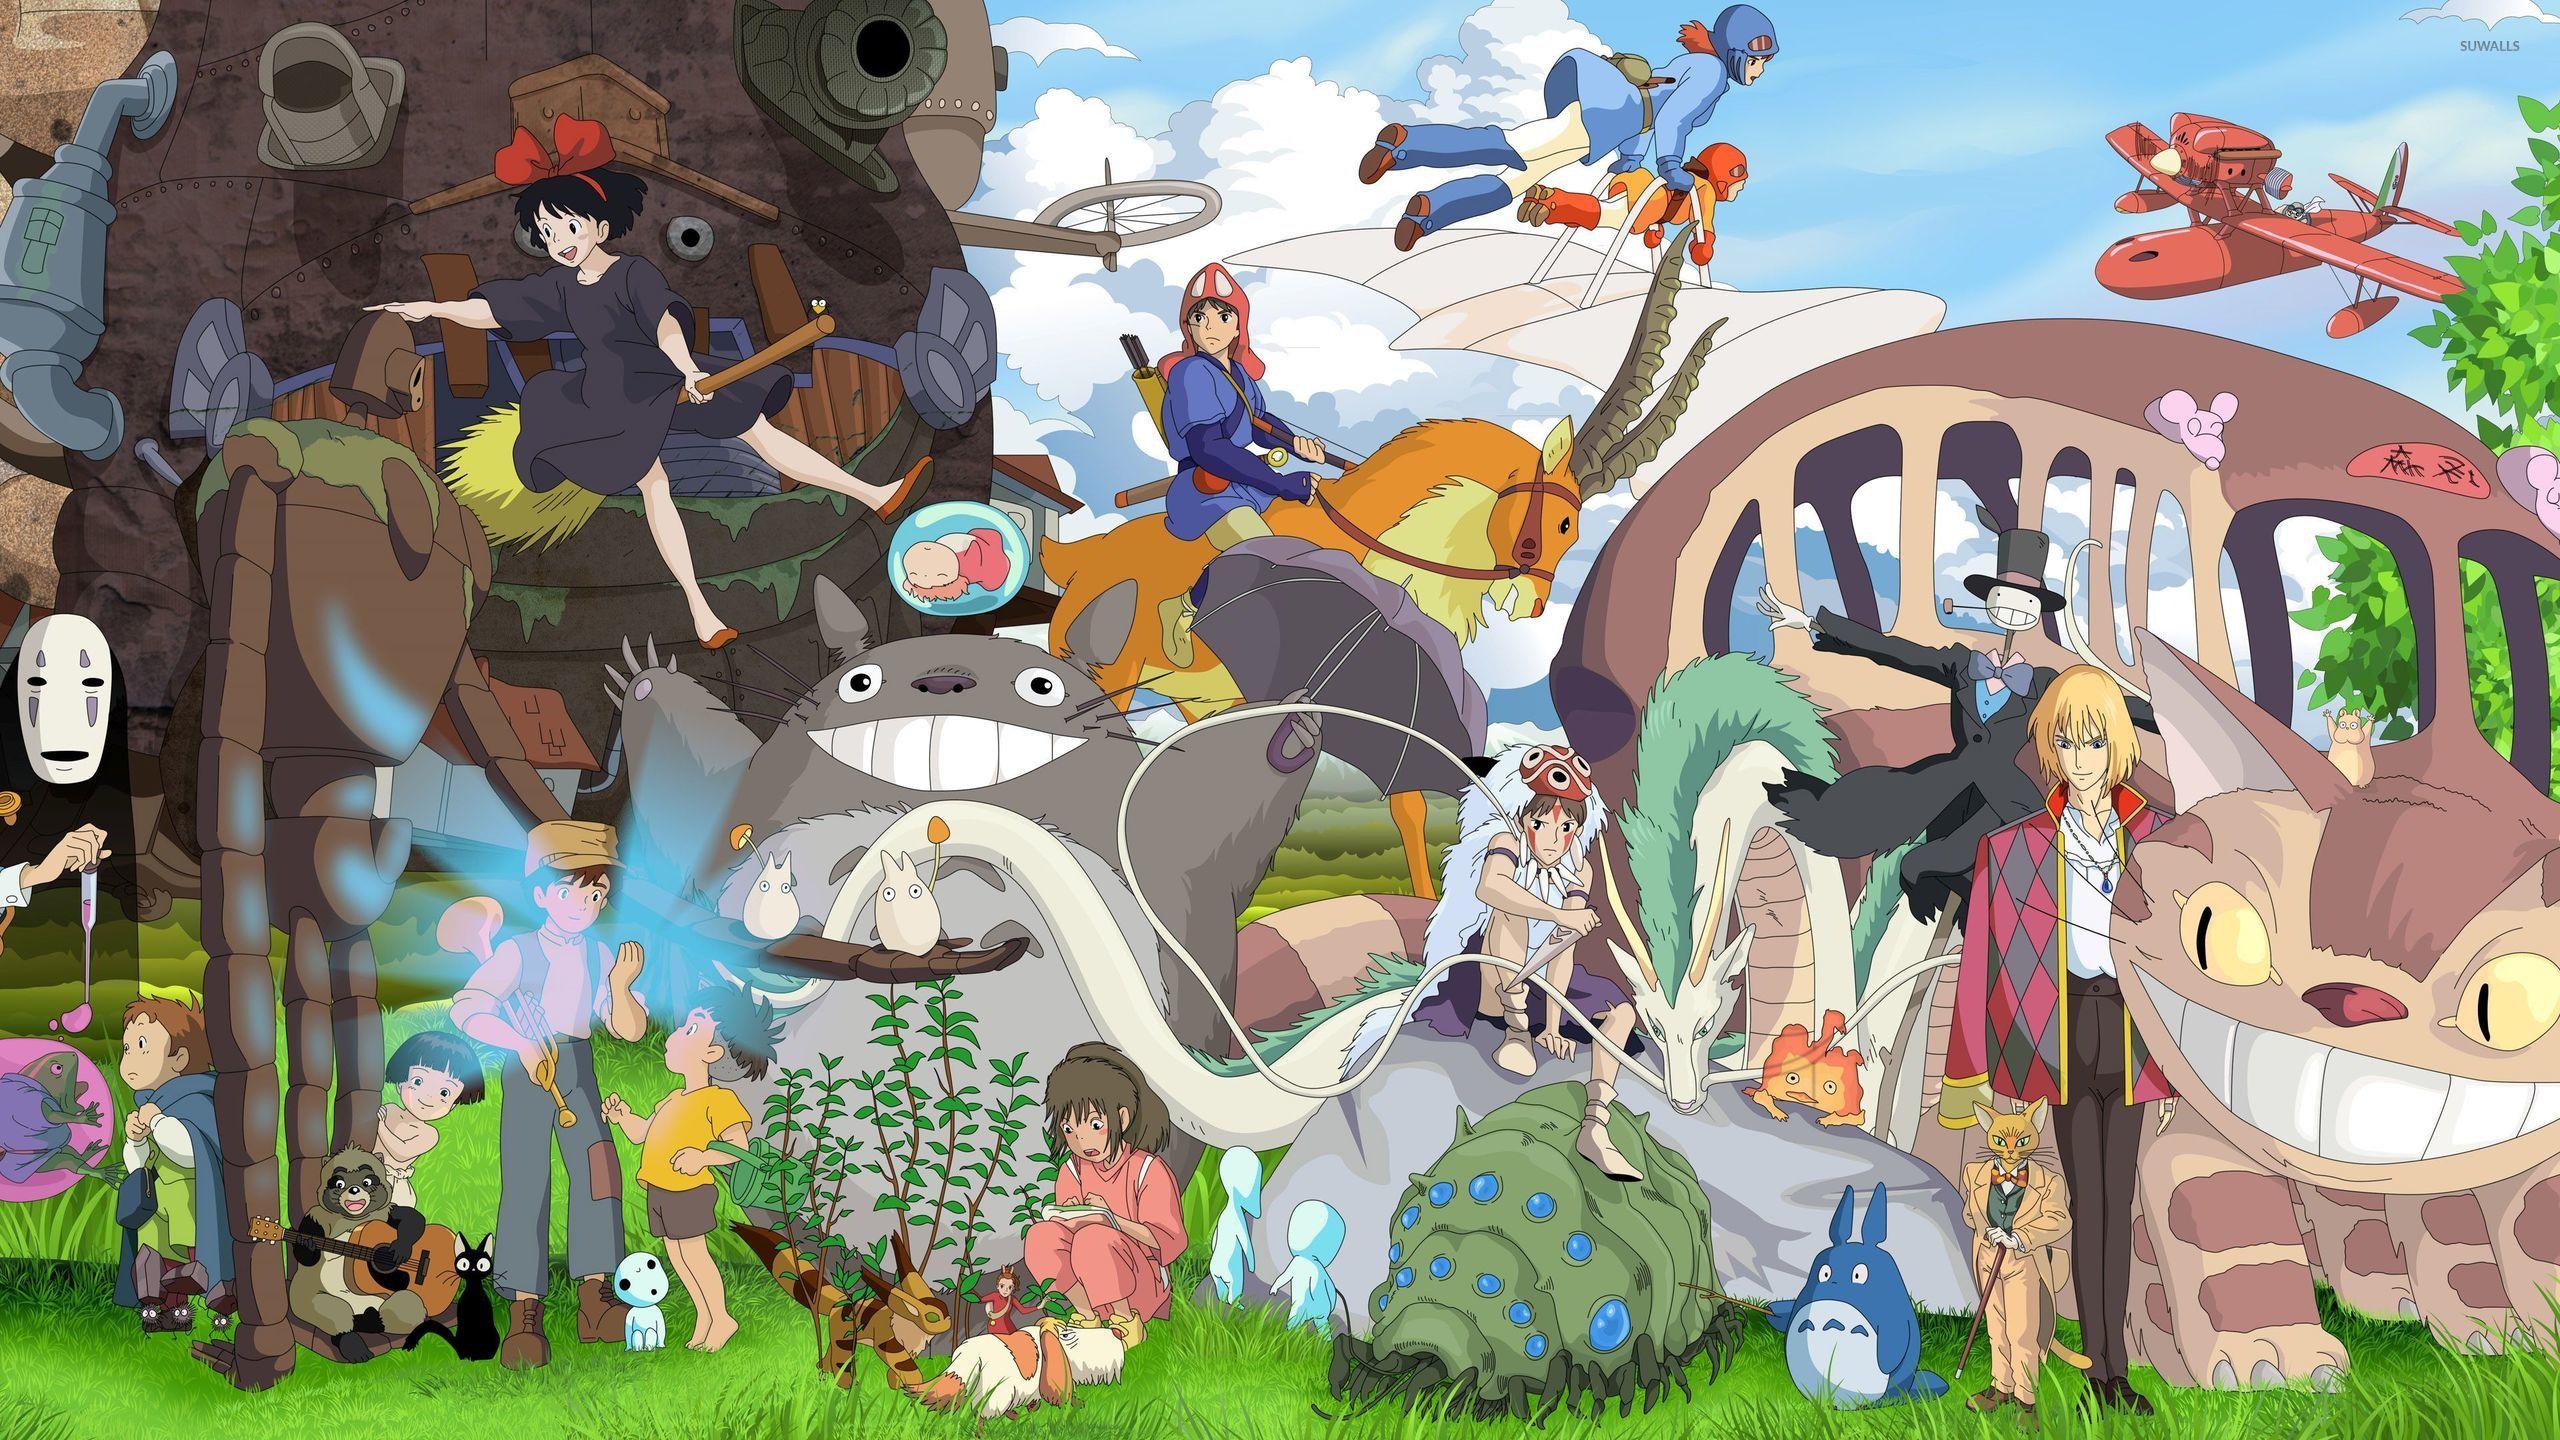 Studio Ghibli characters wallpaper - Anime wallpapers - #36913